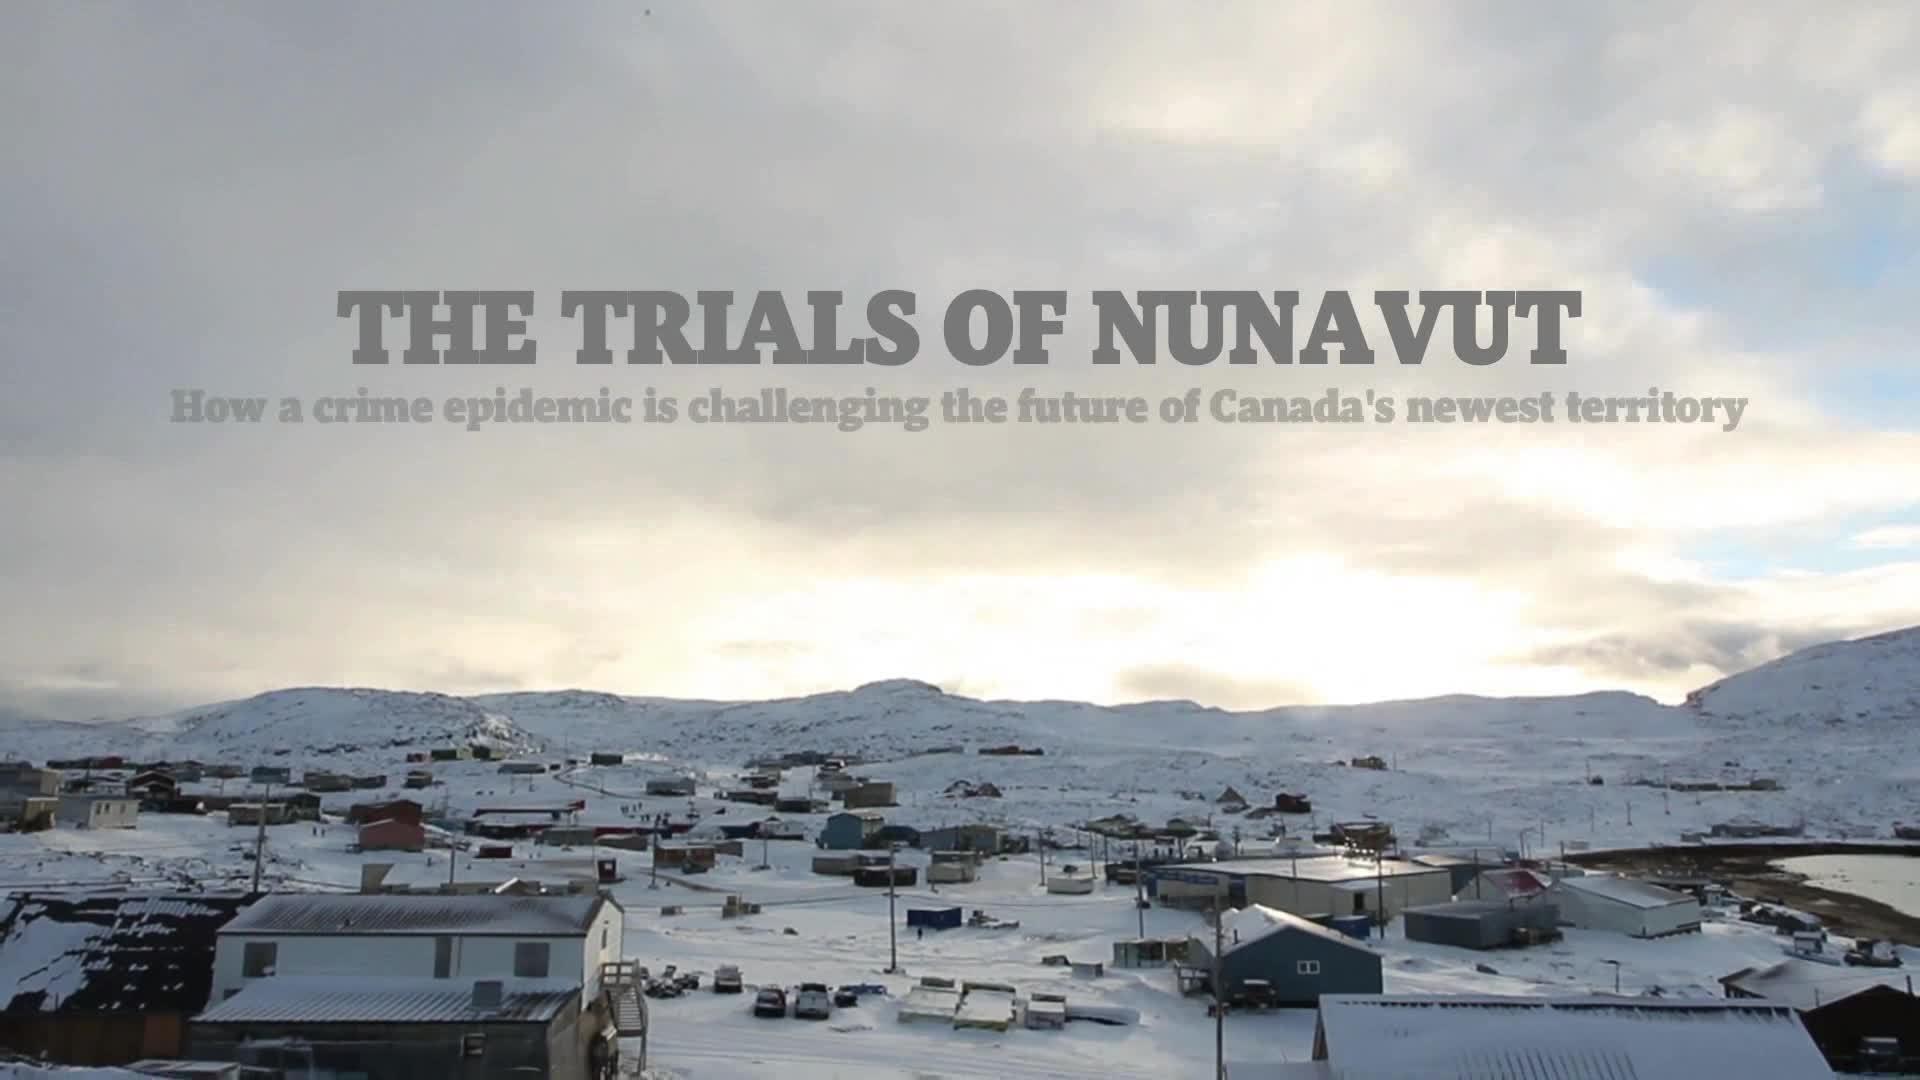 Webby Award Nominee - The Trials of Nunavut